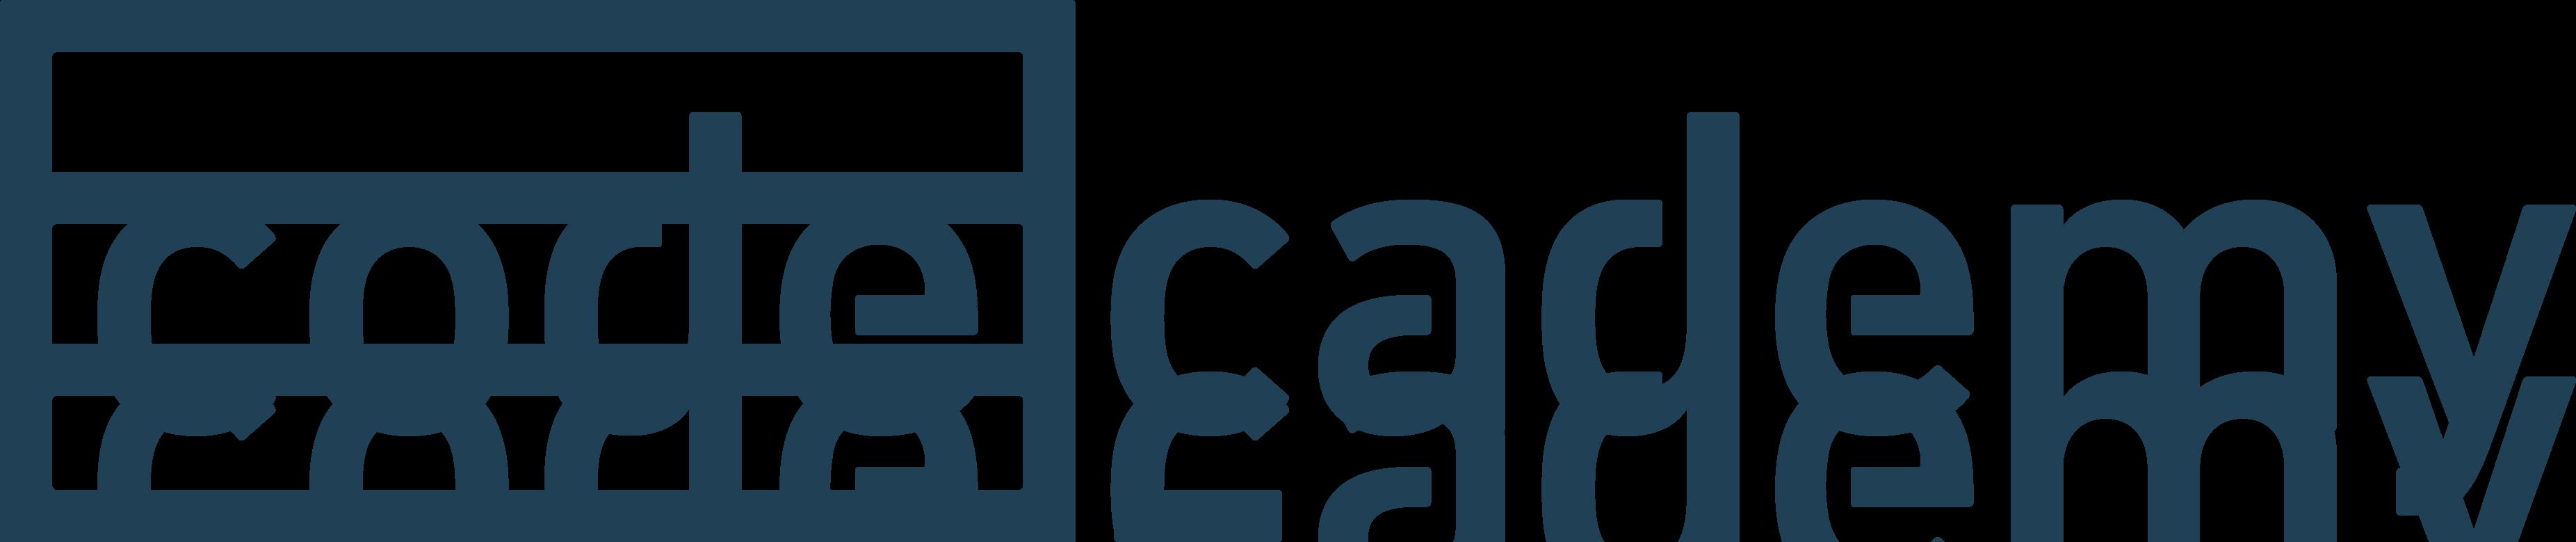 logo blue dark